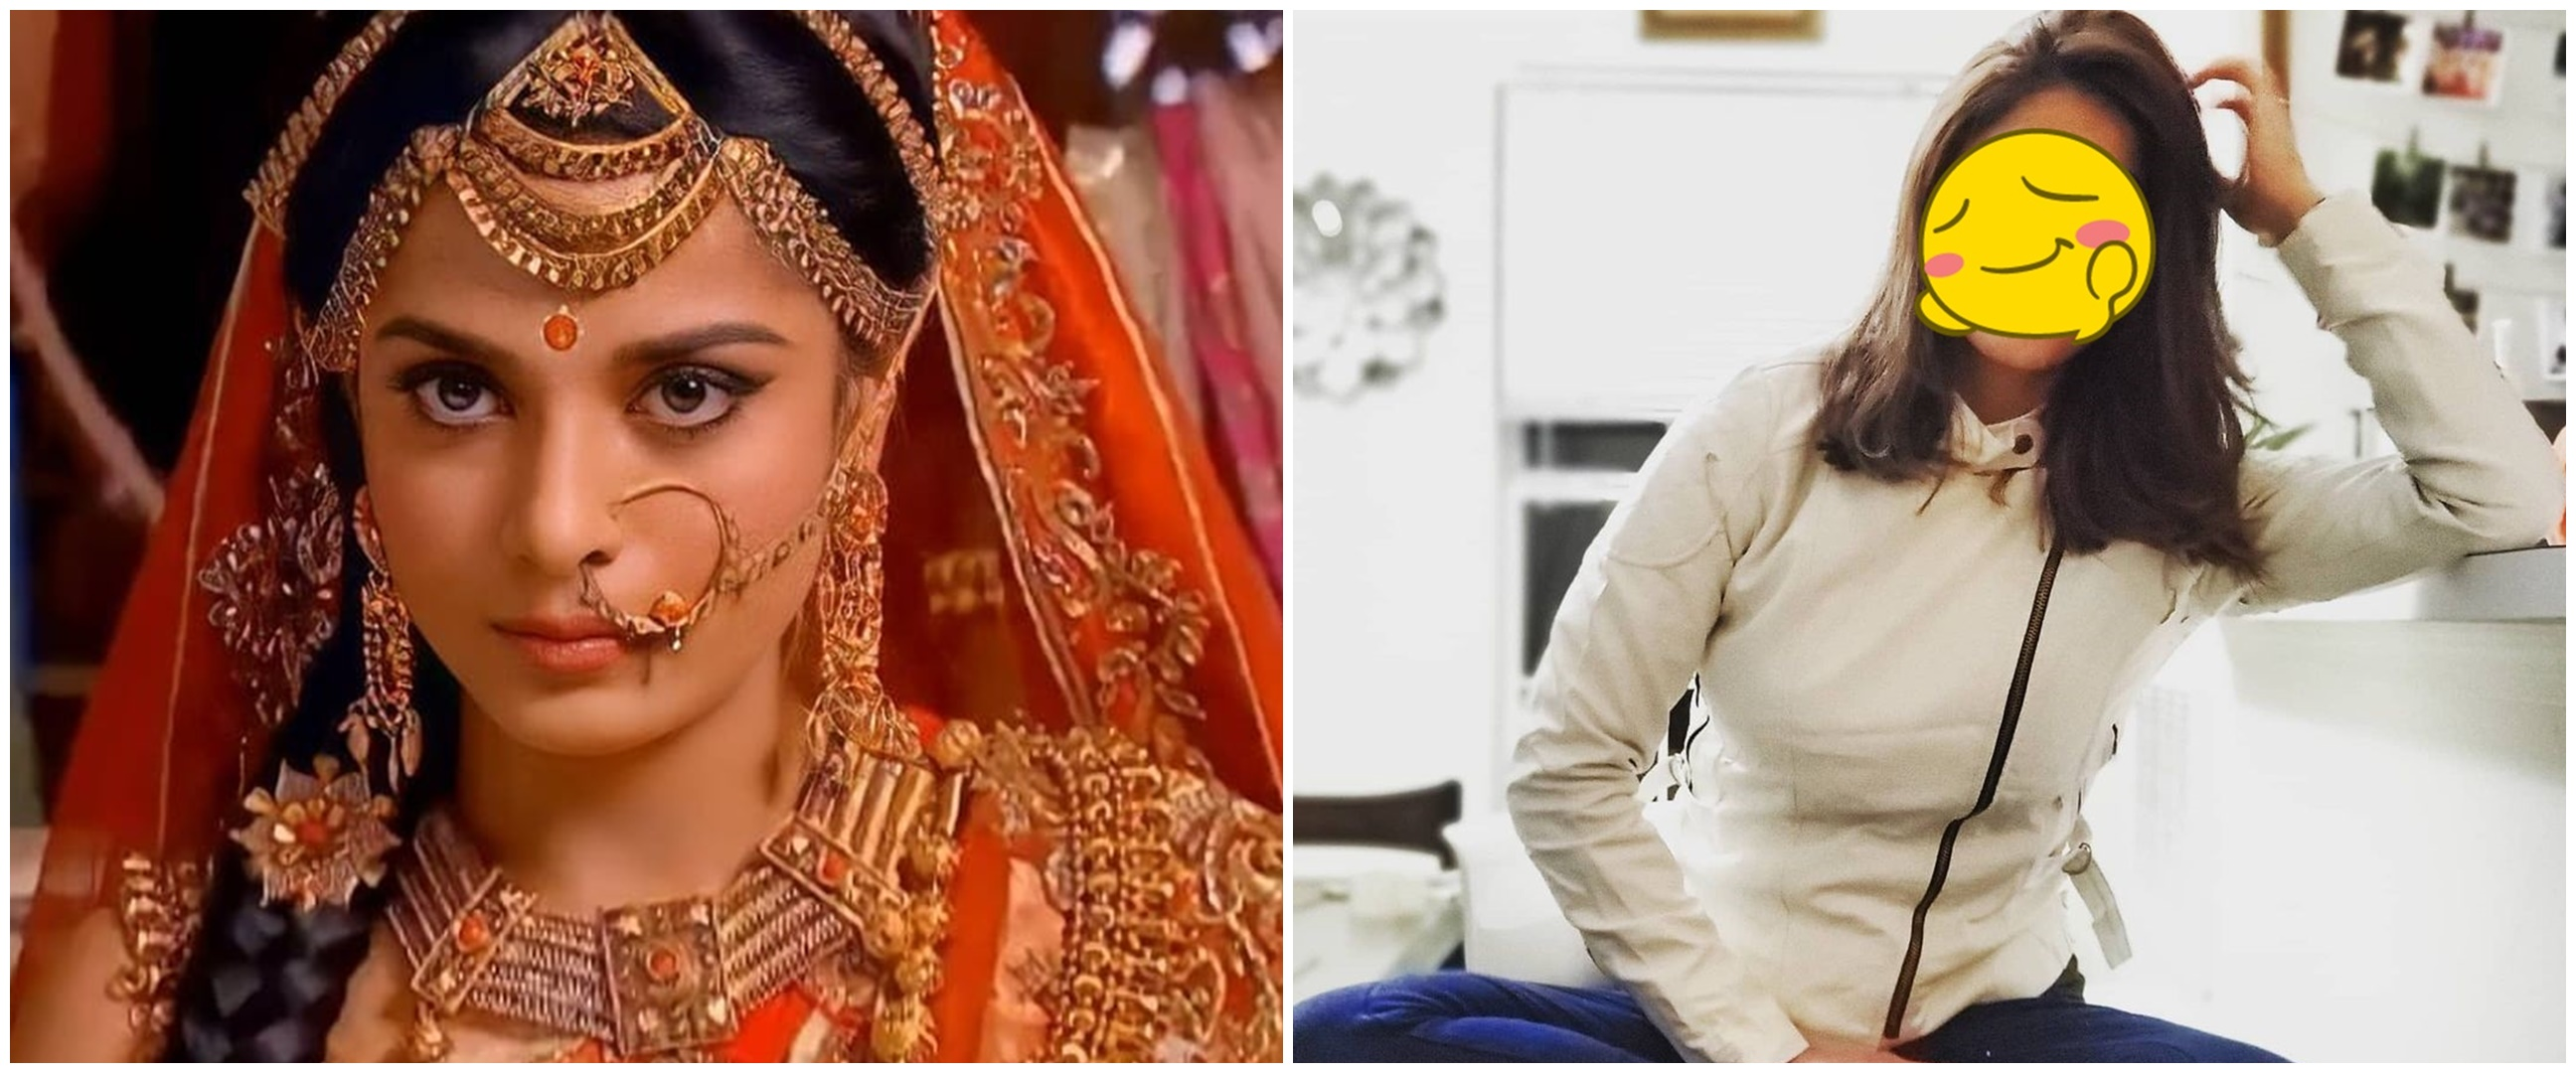 Potret 10 artis cantik drama kolosal India tanpa makeup, beda banget